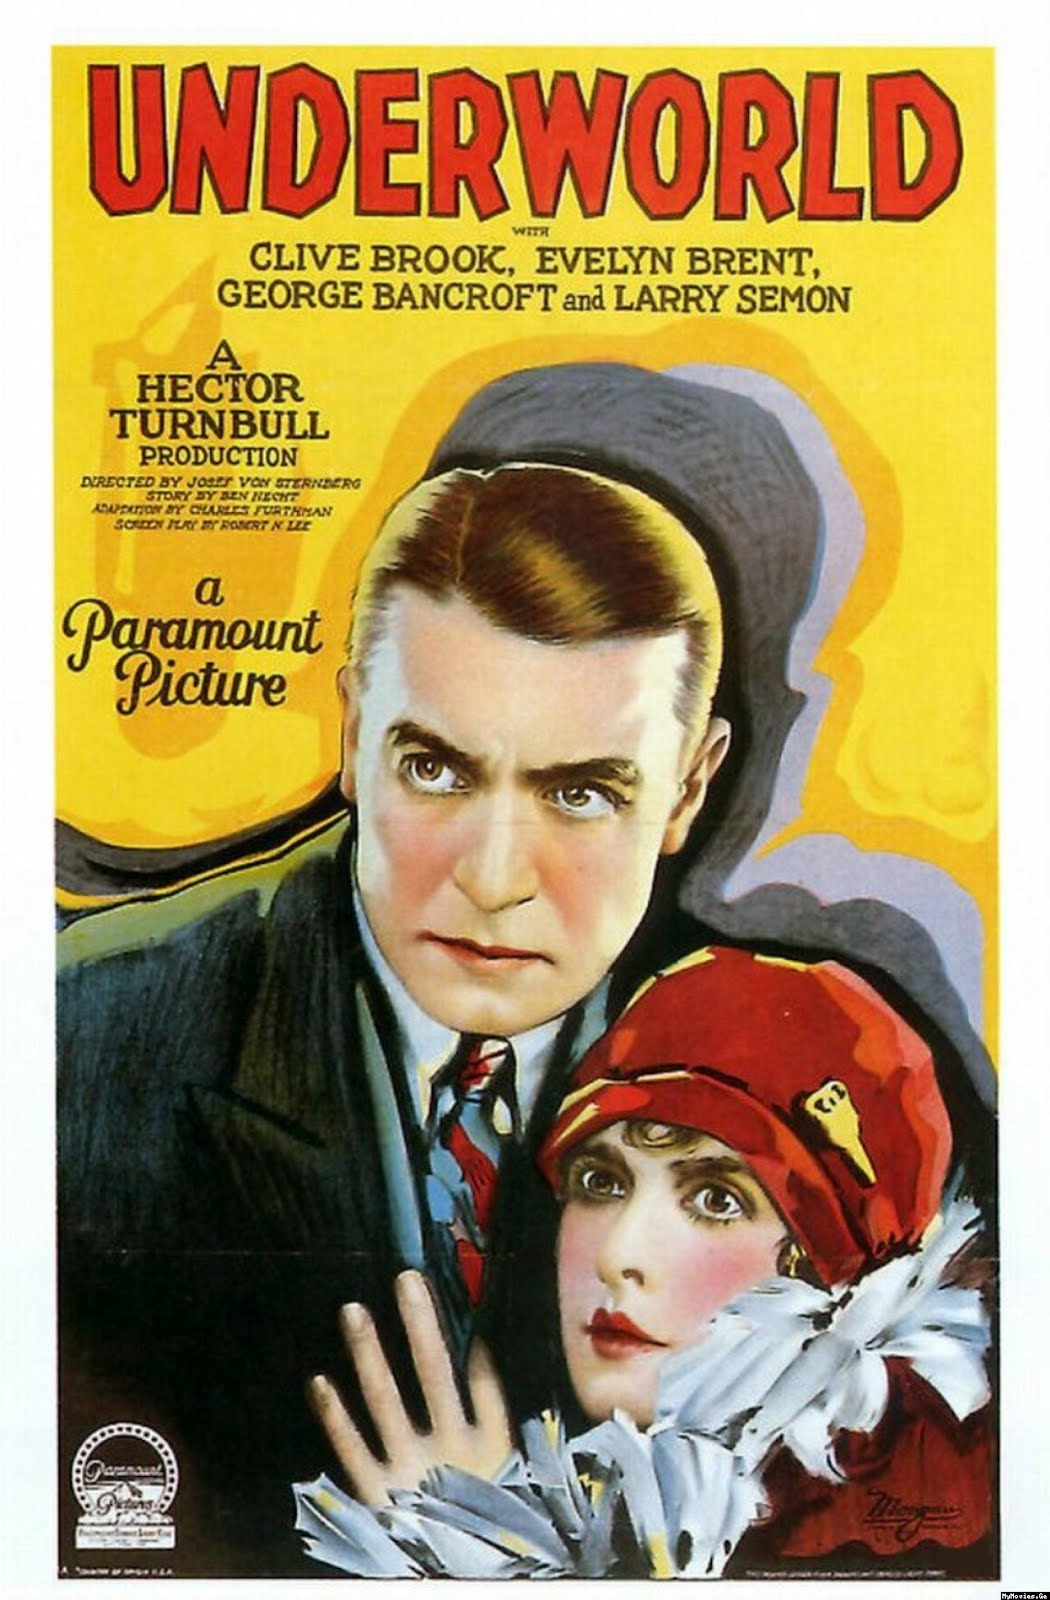 Underworld (1927 film) Jeff Rapsis Silent Film Music Coming Tuesday June 5 Underworld